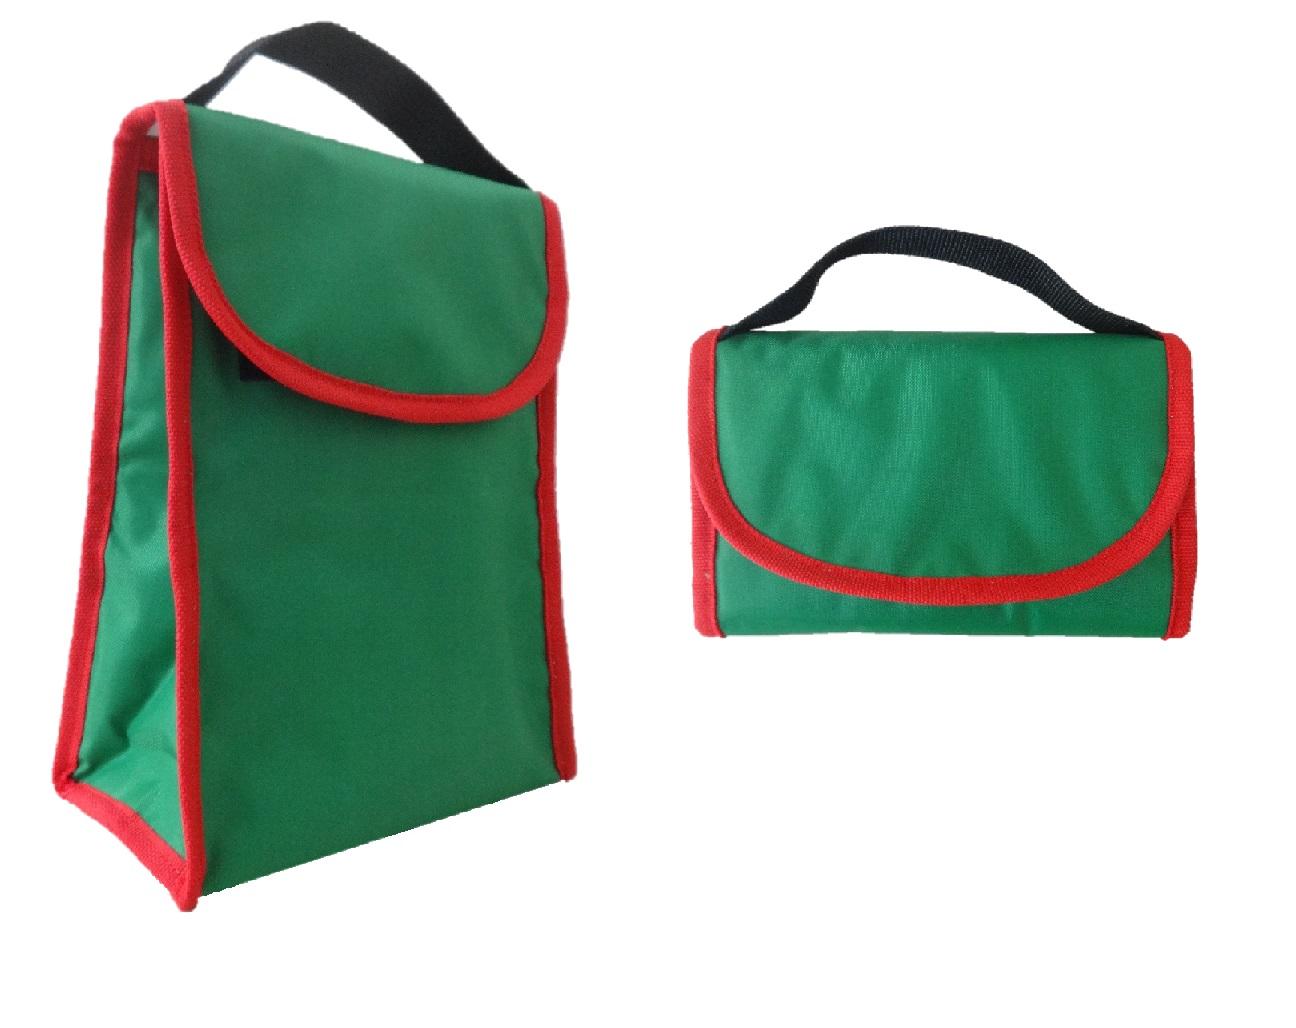 Cooler Bag-(YPCB0011)